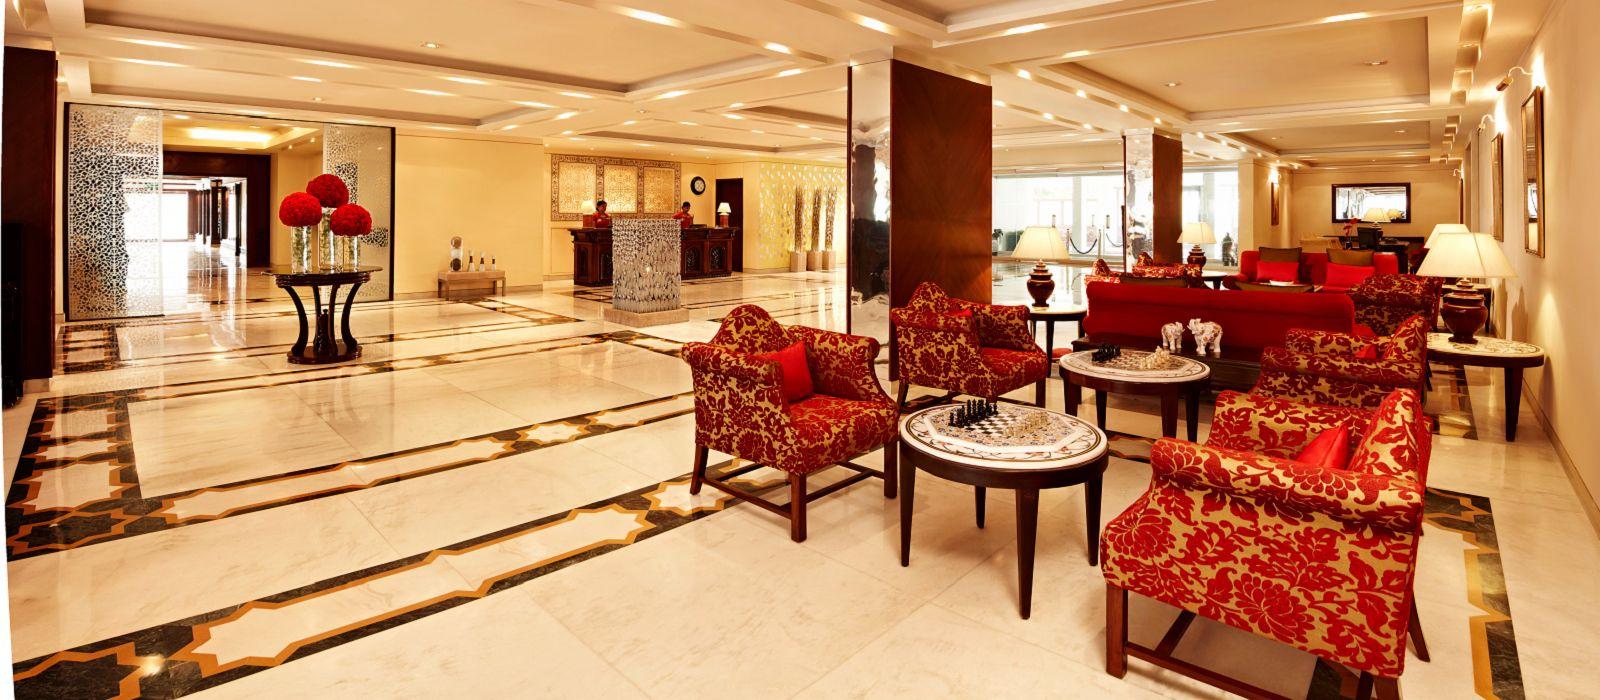 Hotel Tajview, Agra North India